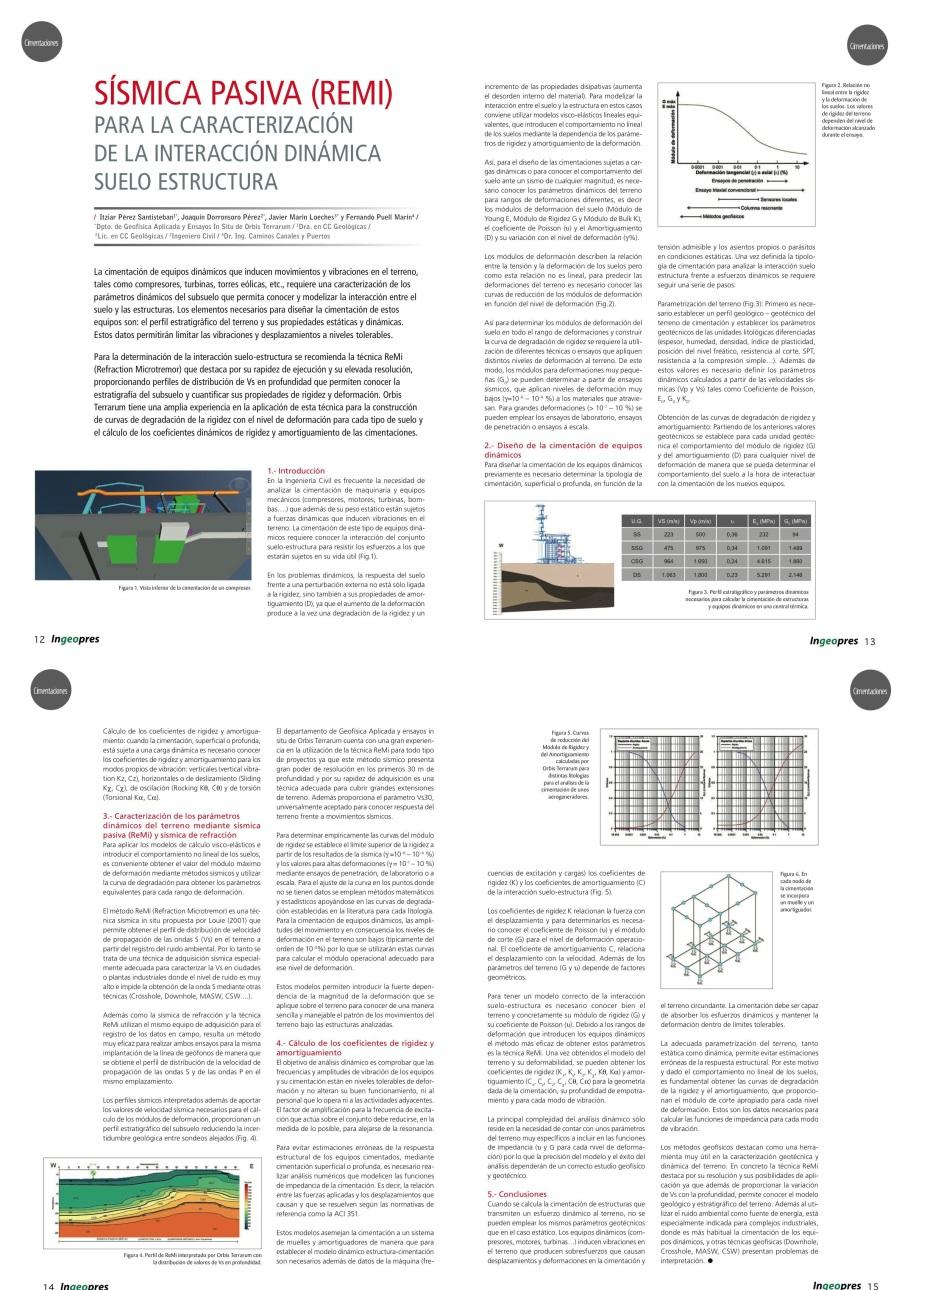 articulo-caracterizacion-dinamica